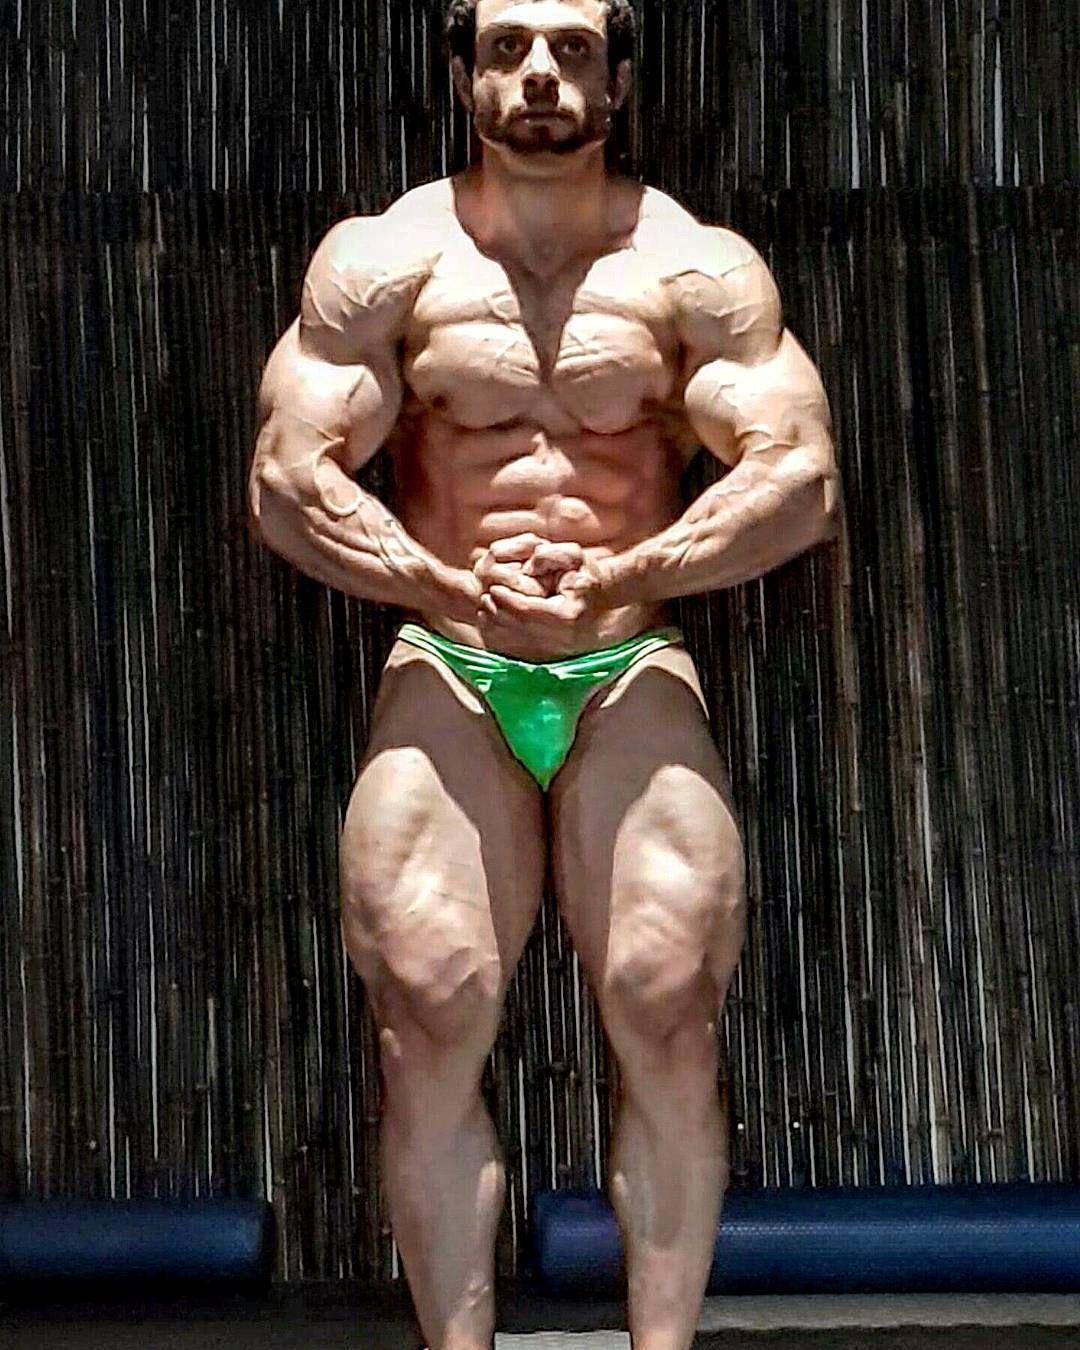 Jacob Spiteri Pt Derrimut Cs Bodybuilder Powerlifter Rubyhains Advanced Sports Nutrition Ifbb Mr Australia Ir Bodybuilding Arnold Classic Gym Gear